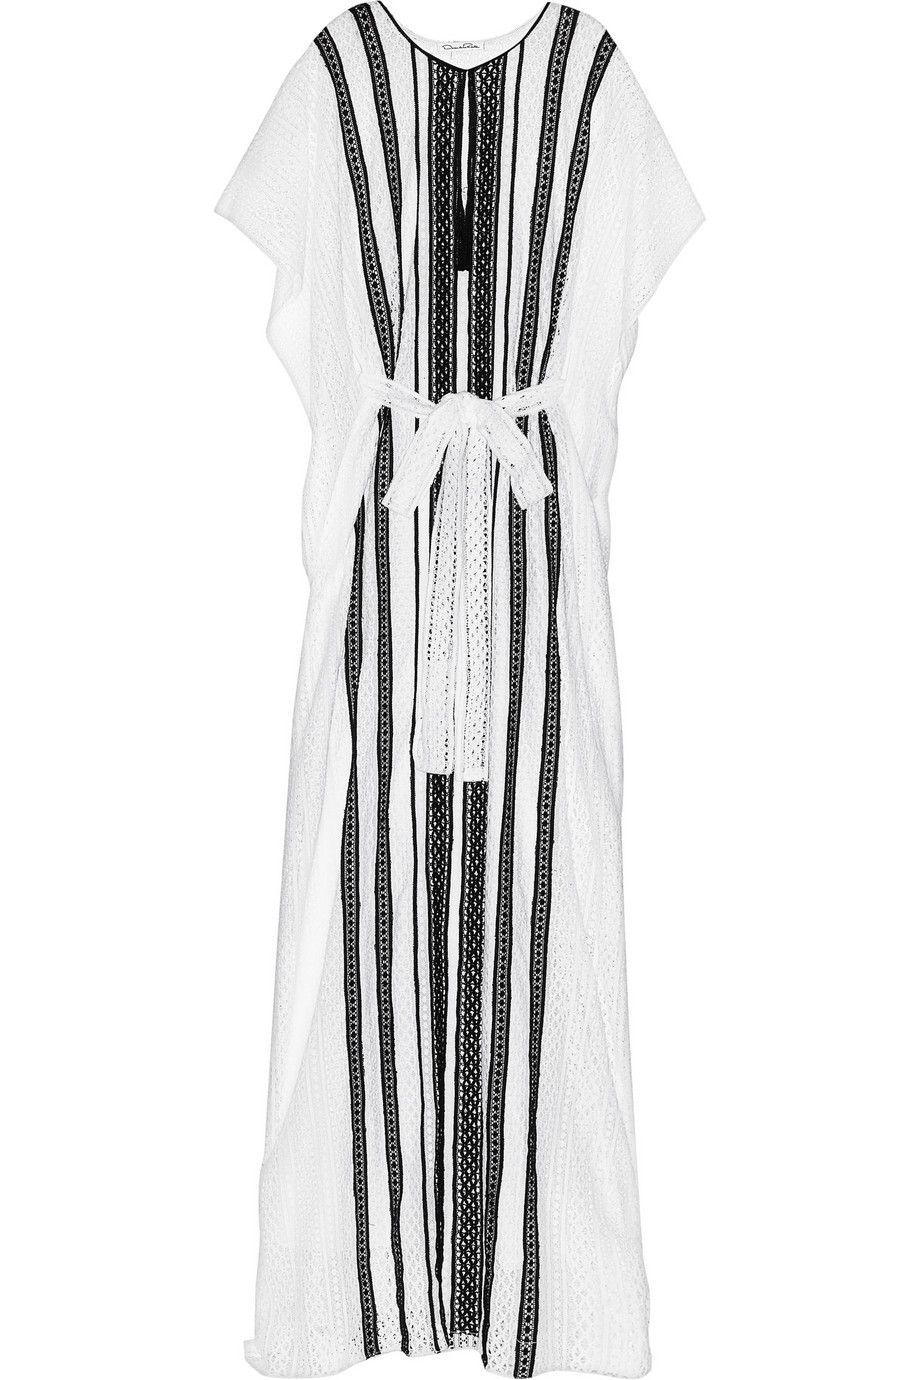 Oscar de la Renta Striped crocheted cotton kaftan